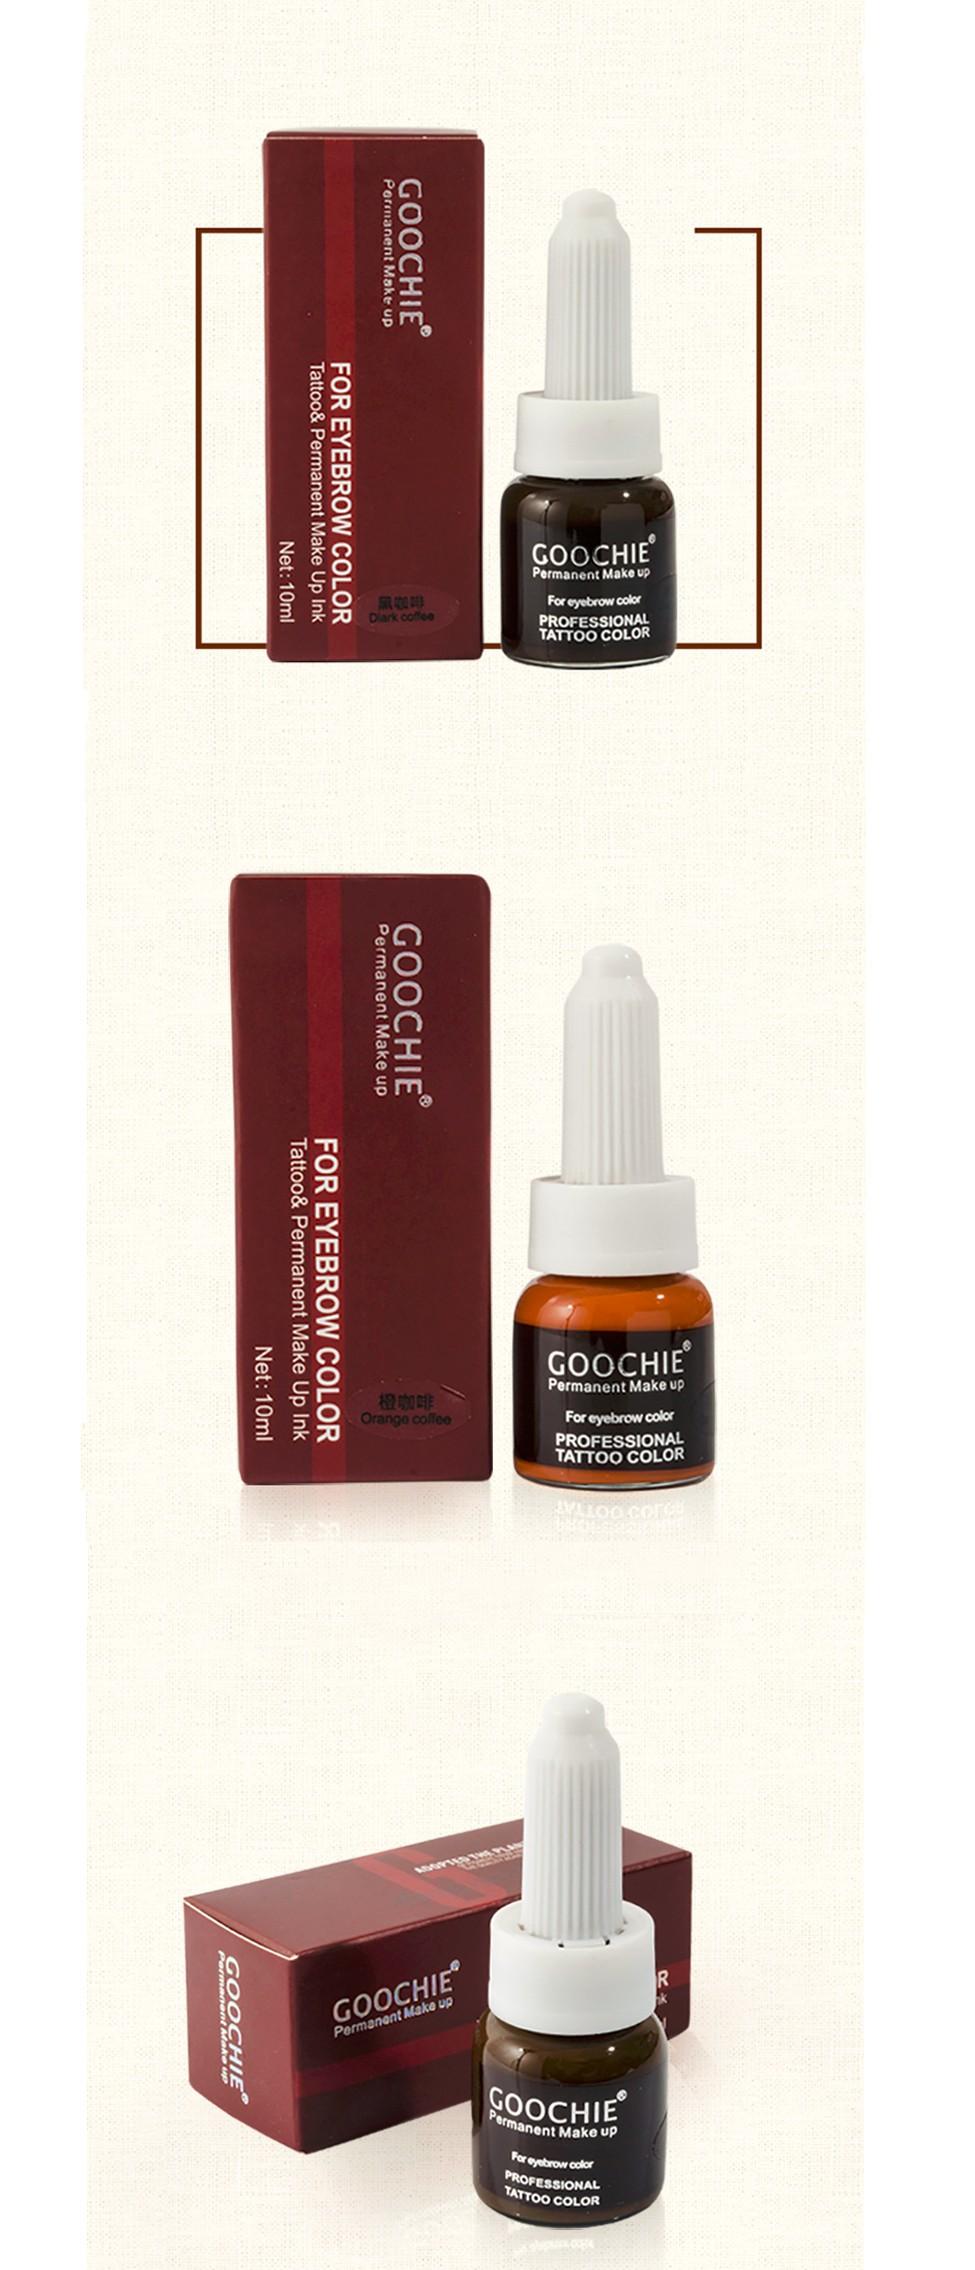 goochie permanentmakeup pigment